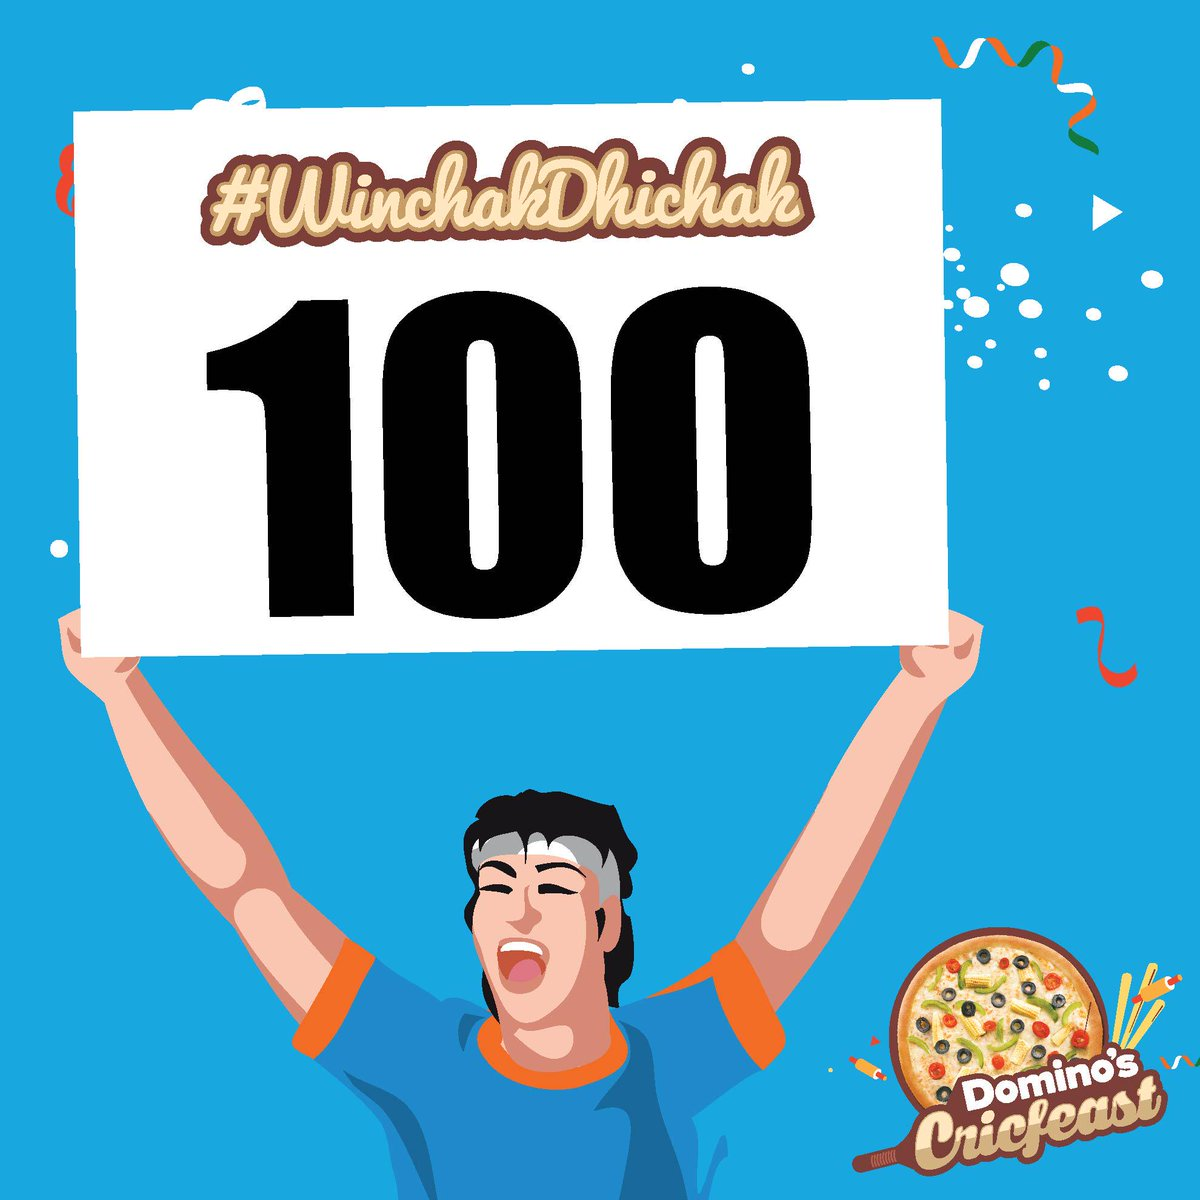 #WinchakDhichak #contest Q1. Which batsman hit a century against SA this Sunday? http://t.co/NGyAJIyxKD